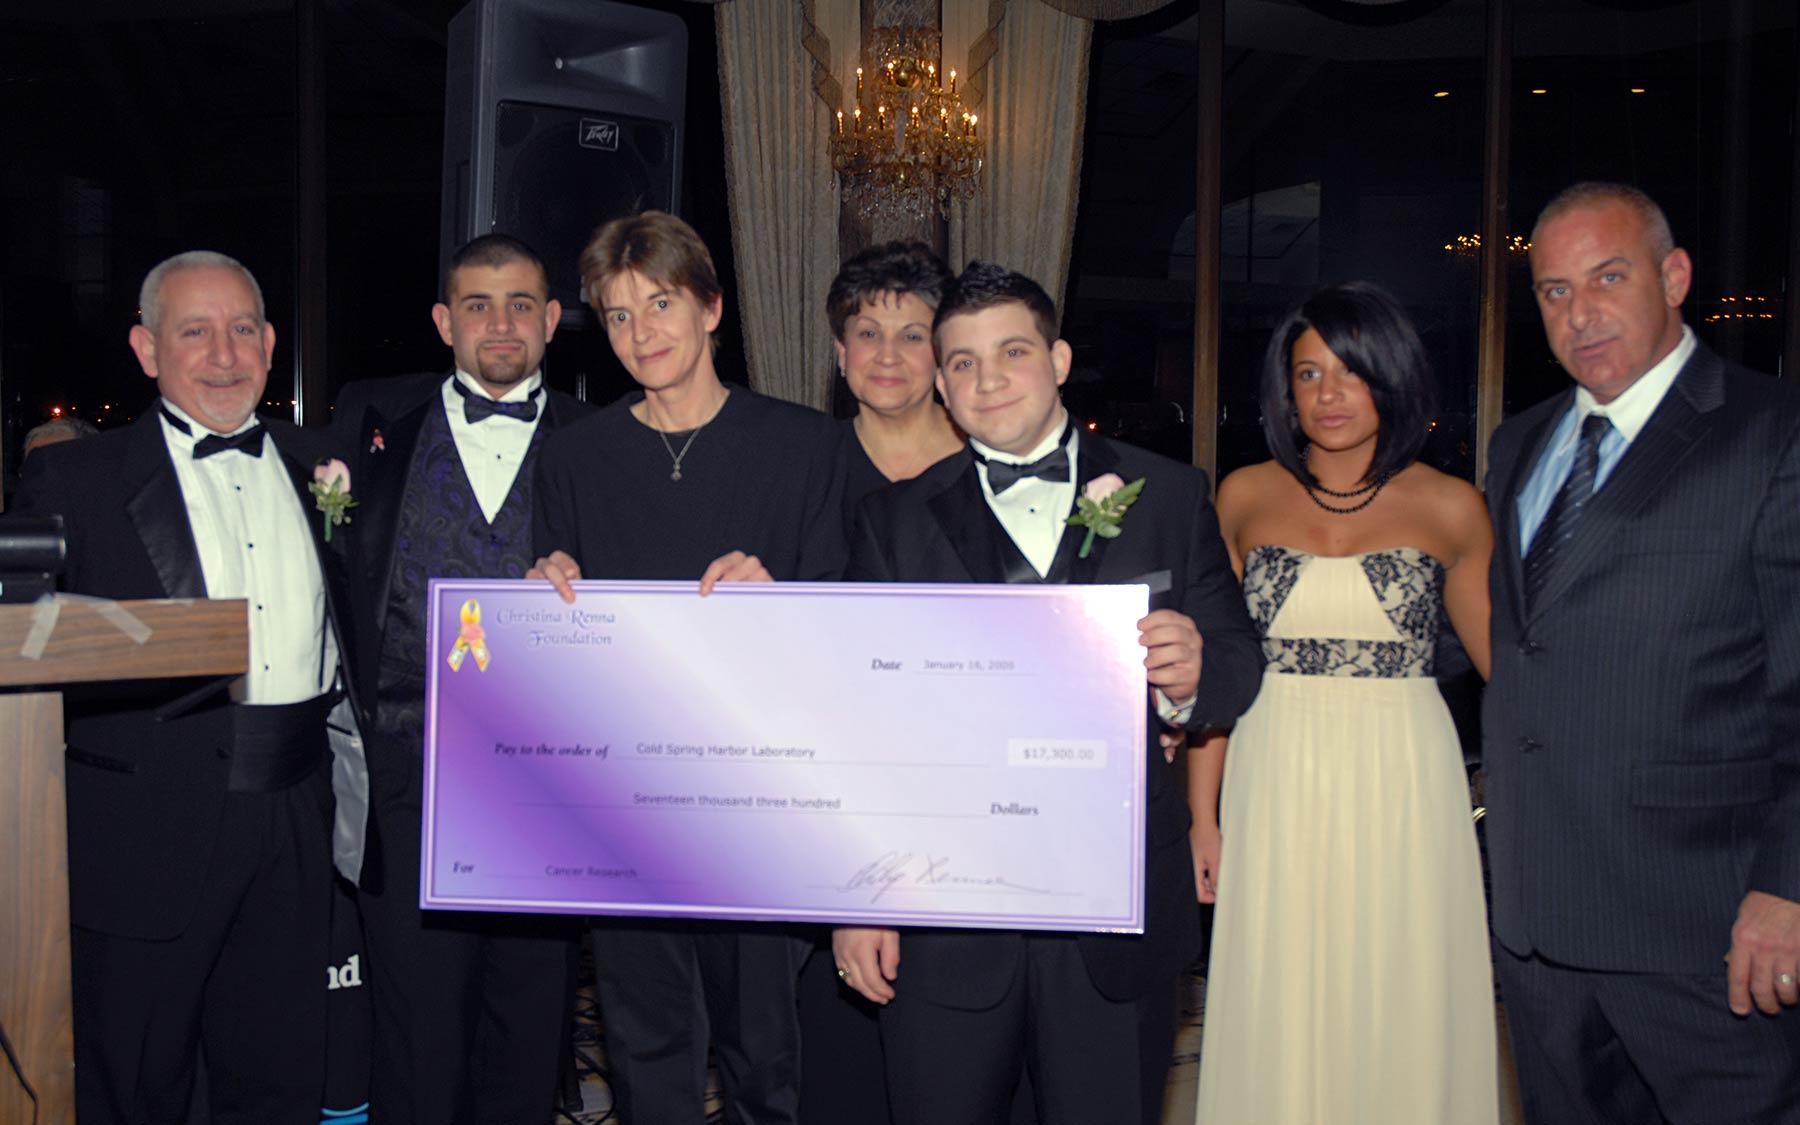 CRF 4 a Cure 2009 check presentation